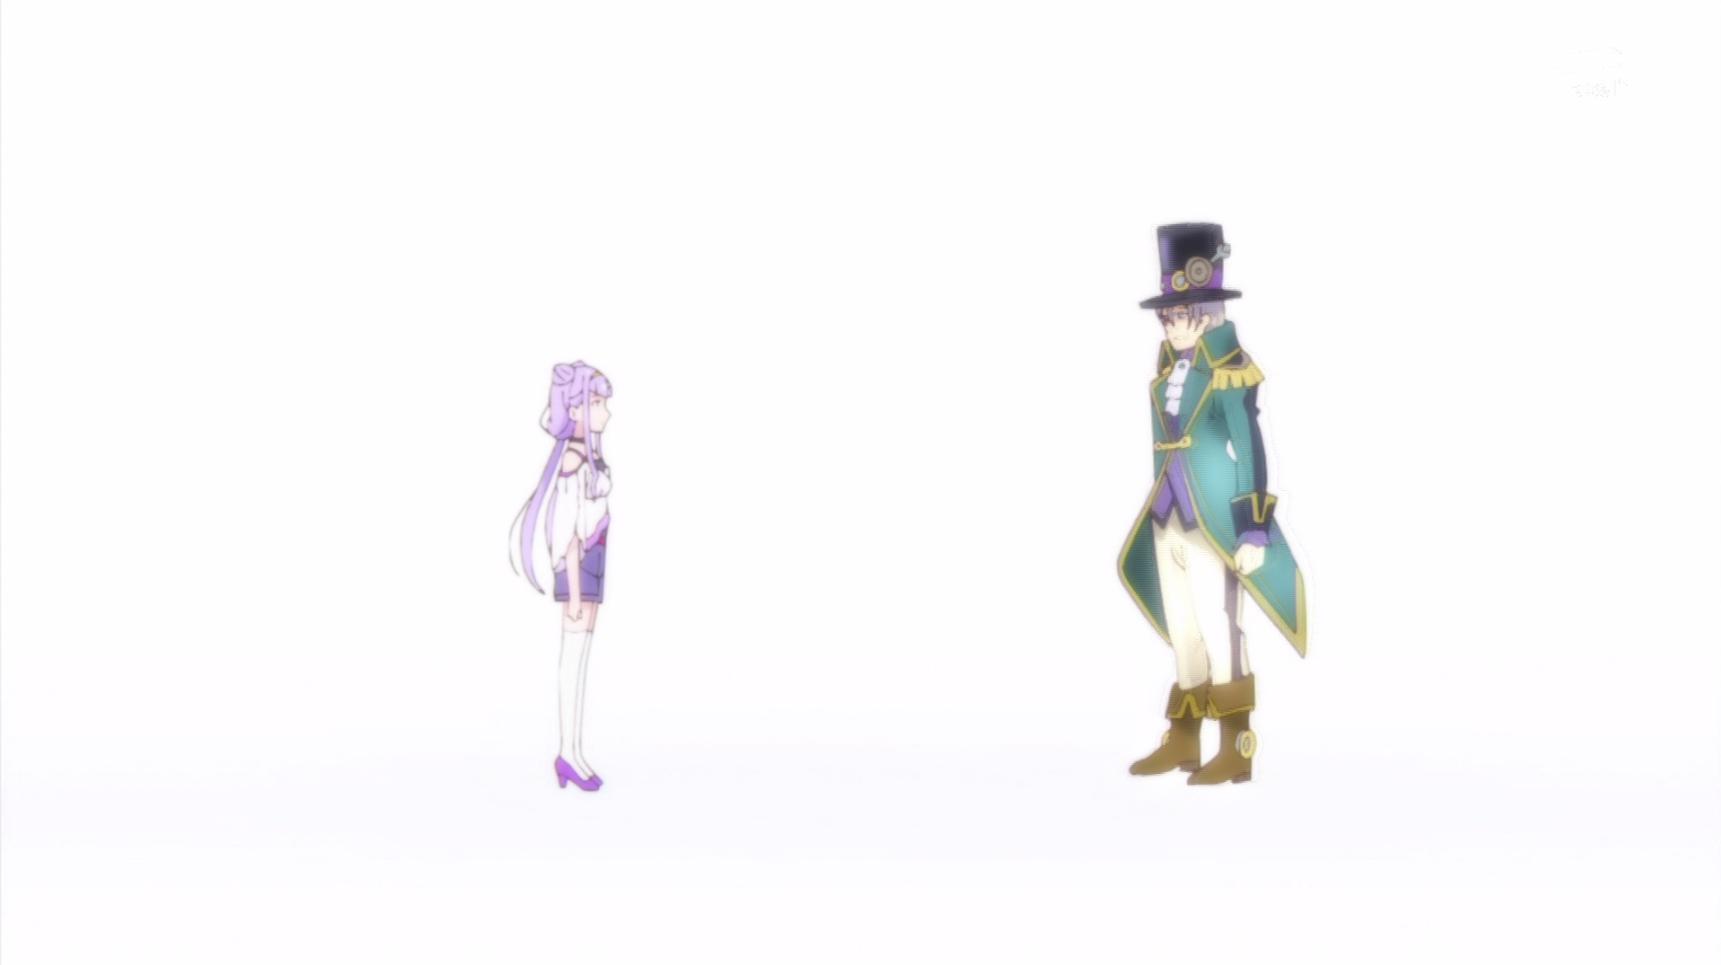 HUGっとプリキュア第37話感想ネタバレ2 (485)